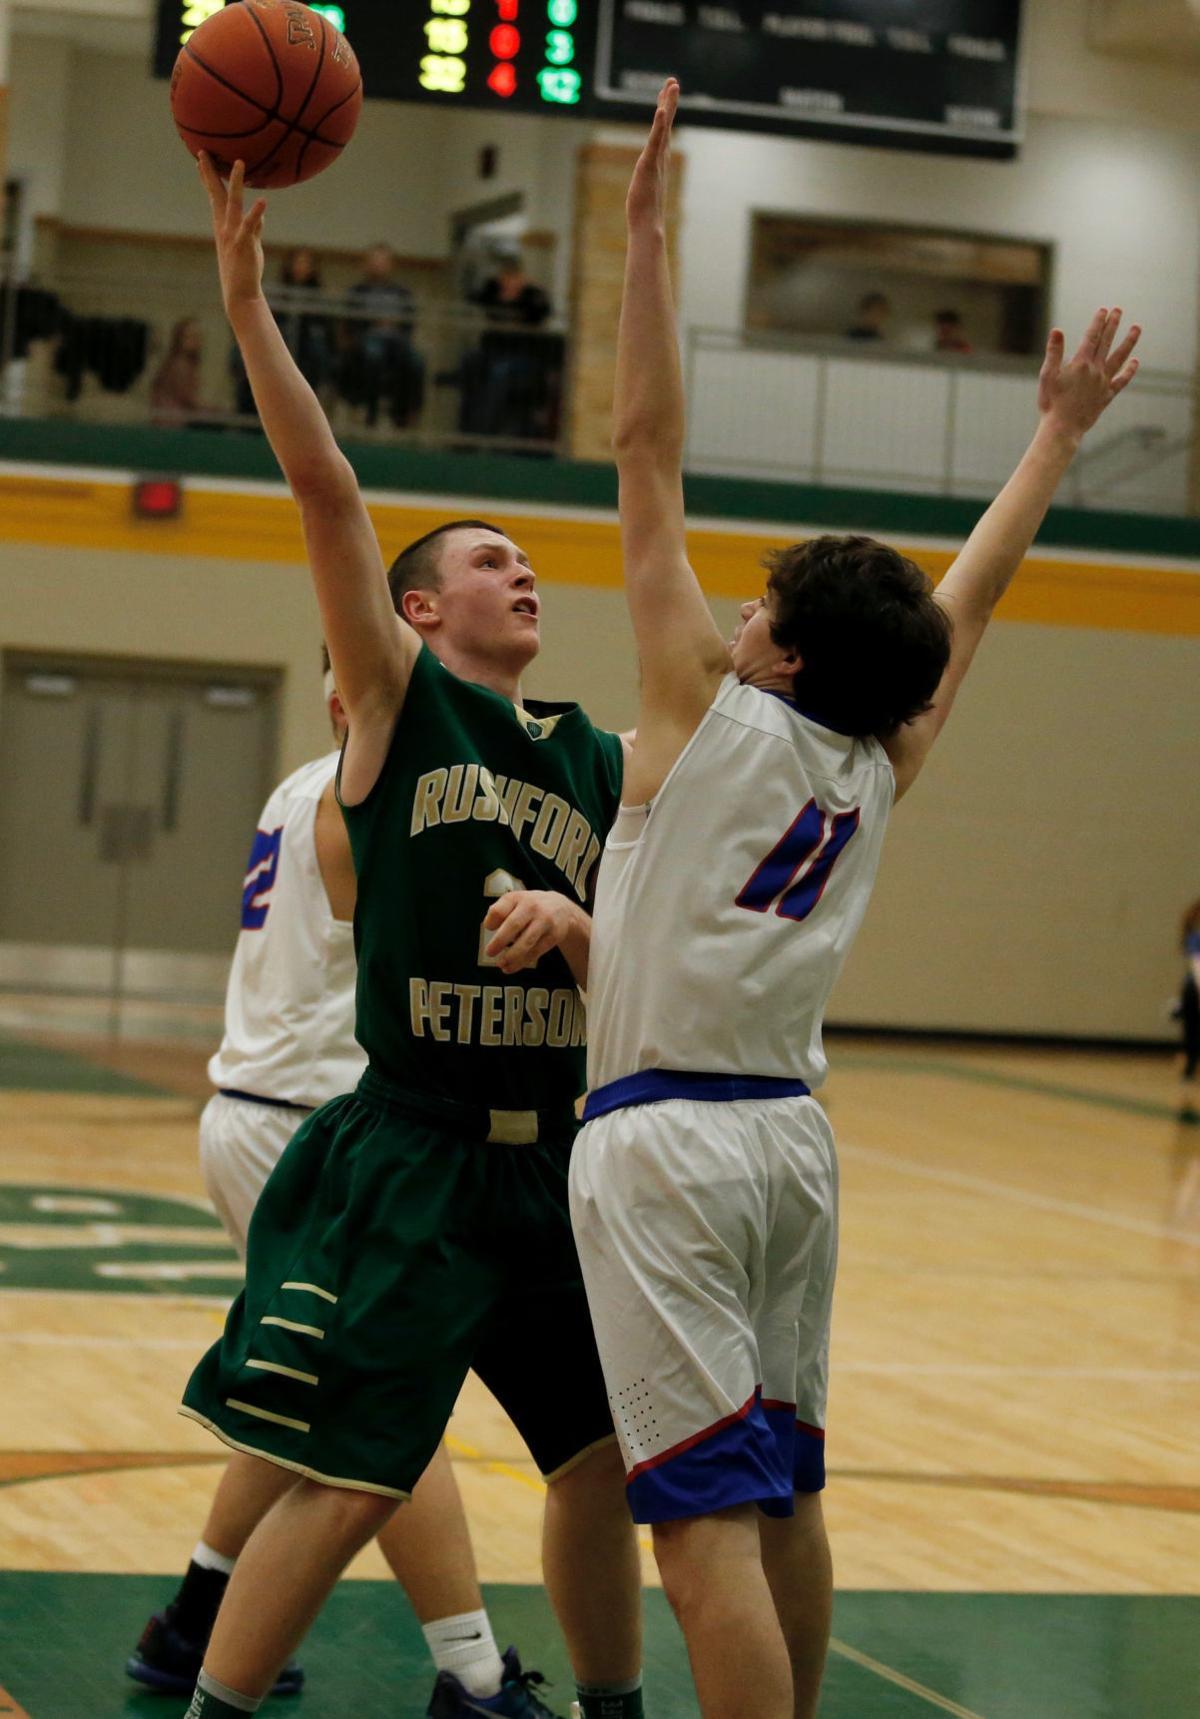 36b887fd9d43 Boys basketball  Second-half intensity lifts Rushford-Peterson past  Kingsland